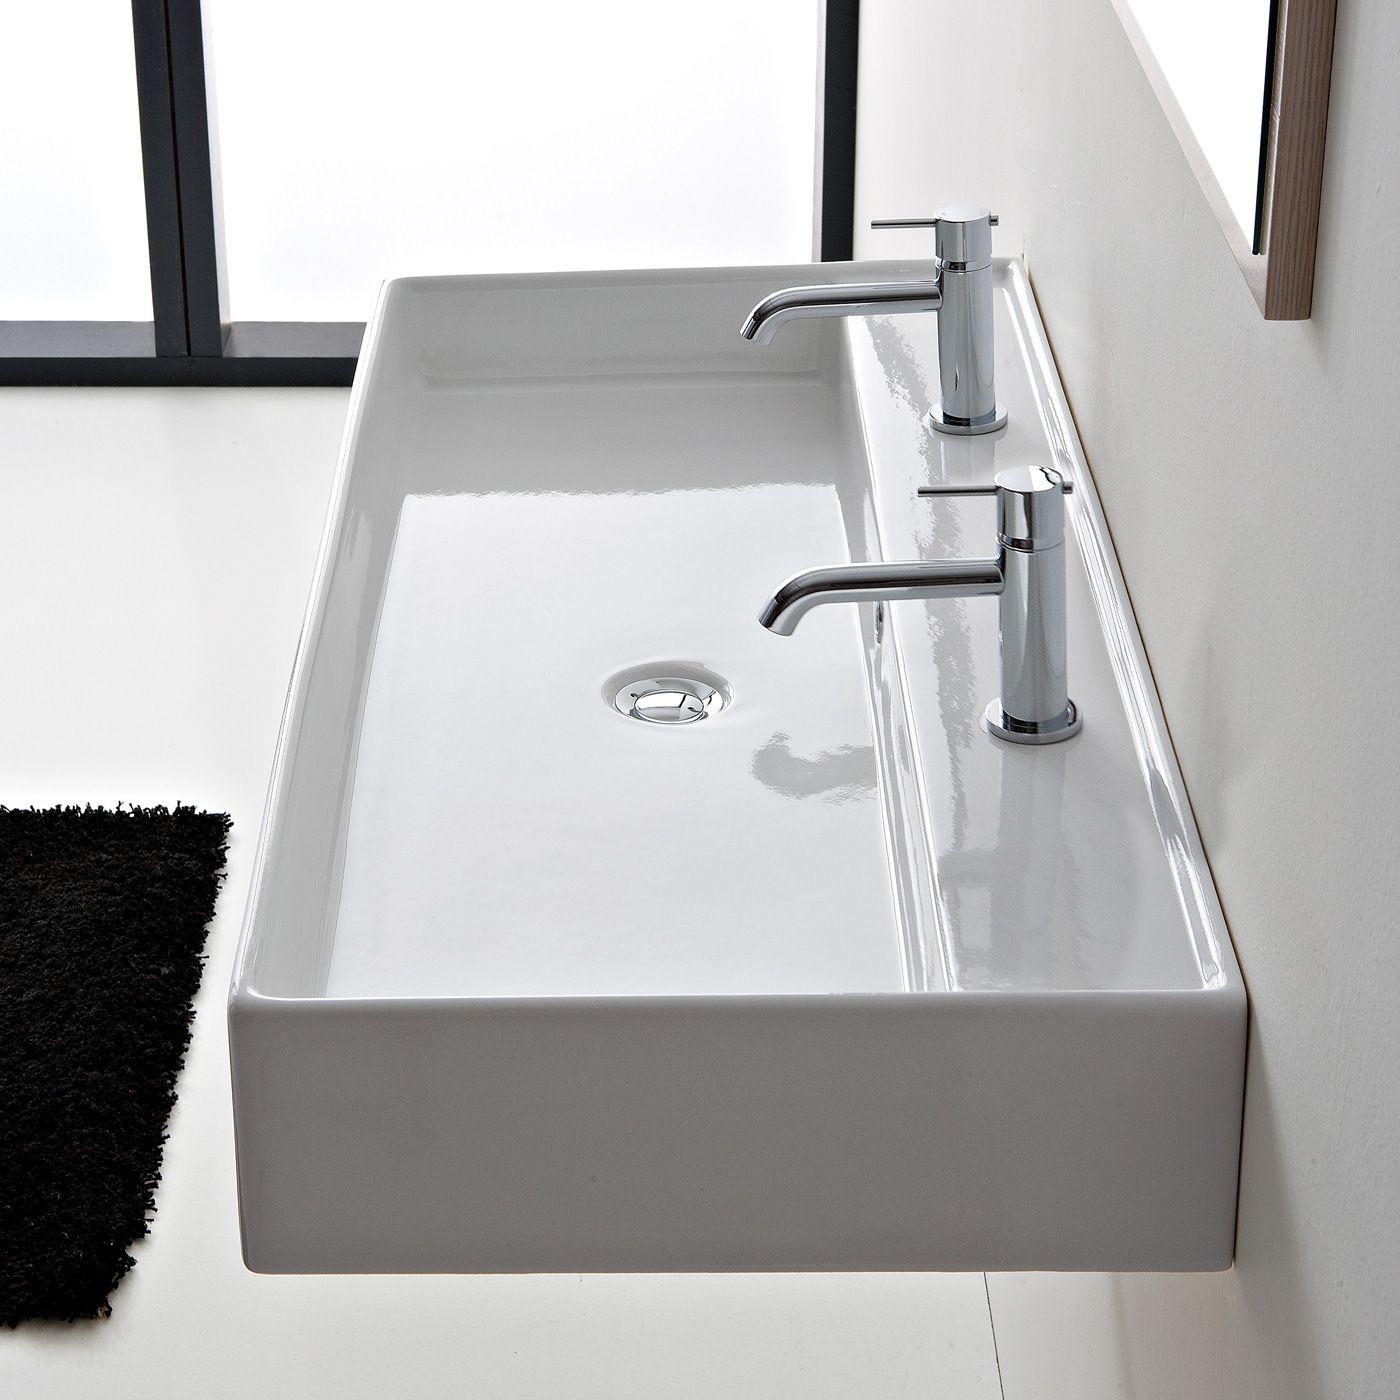 420 € t: 46 cm - 8031r120b | reuter onlineshop | bathroom sink